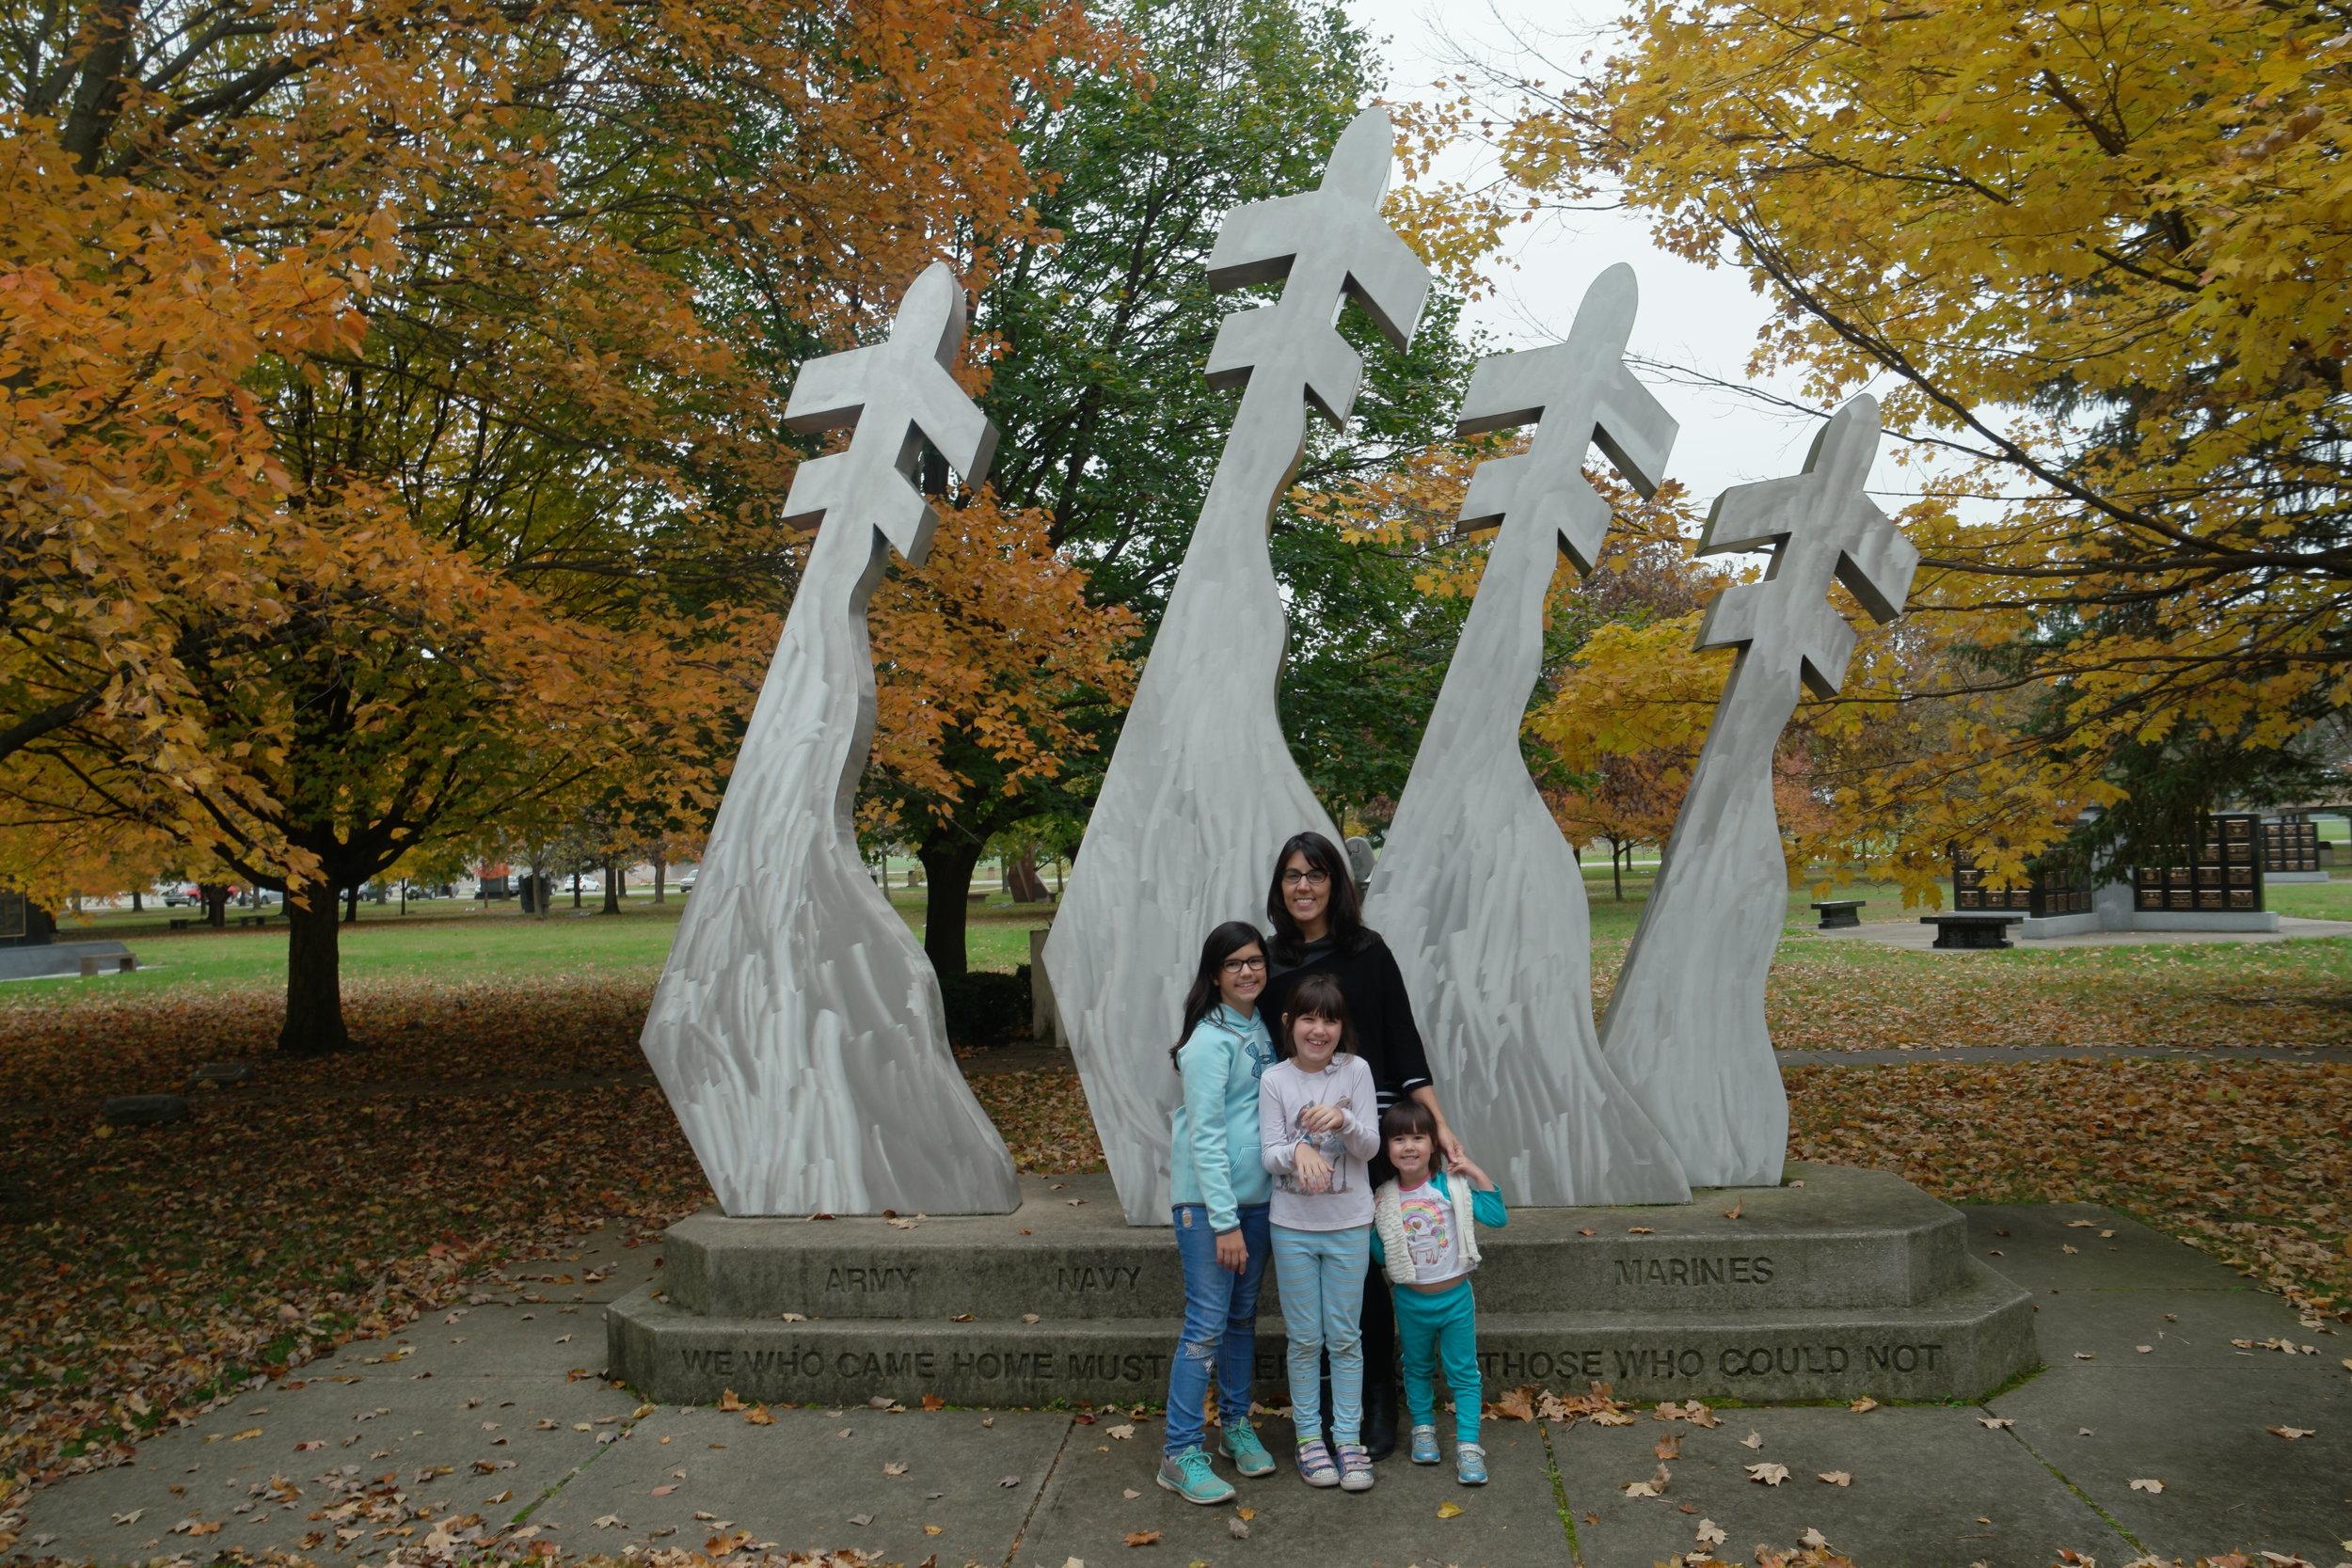 Memorial Garden, United States Air Force Museum, Dayton, Ohio